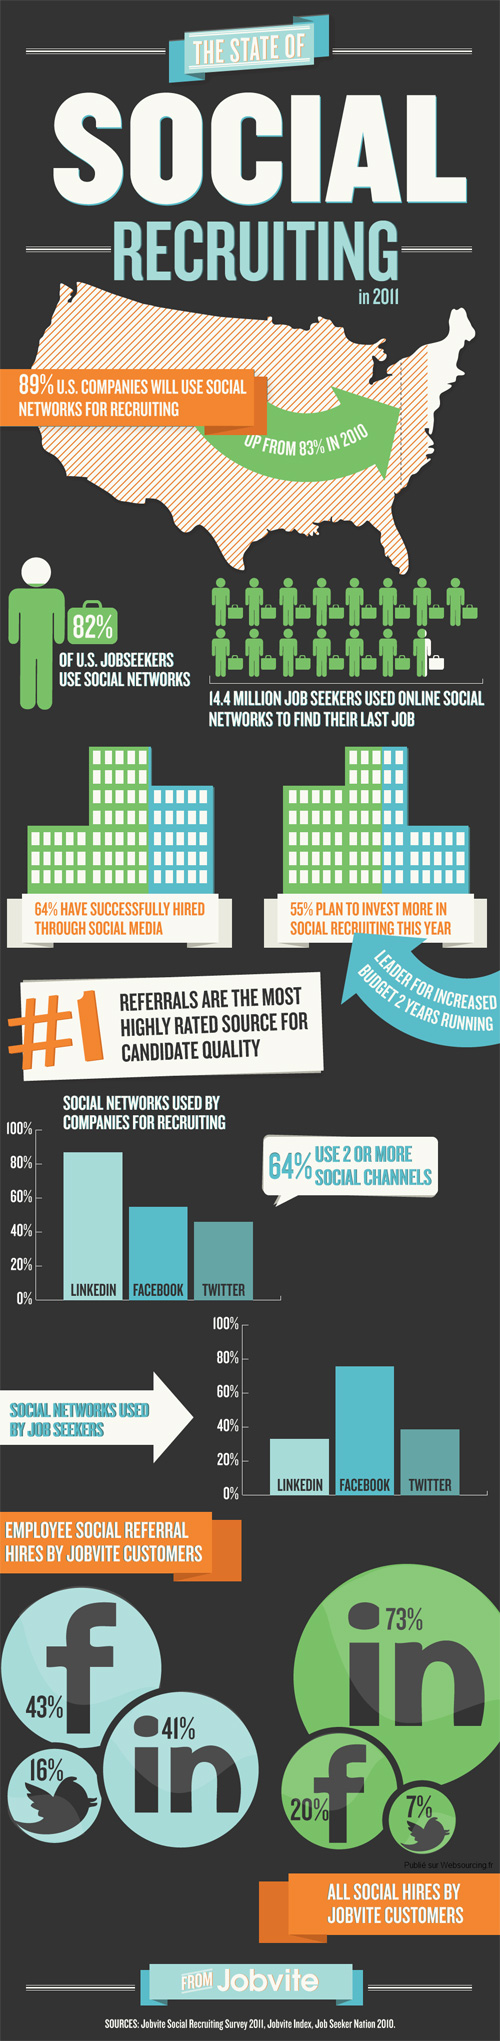 Recrutement Social : Infographie